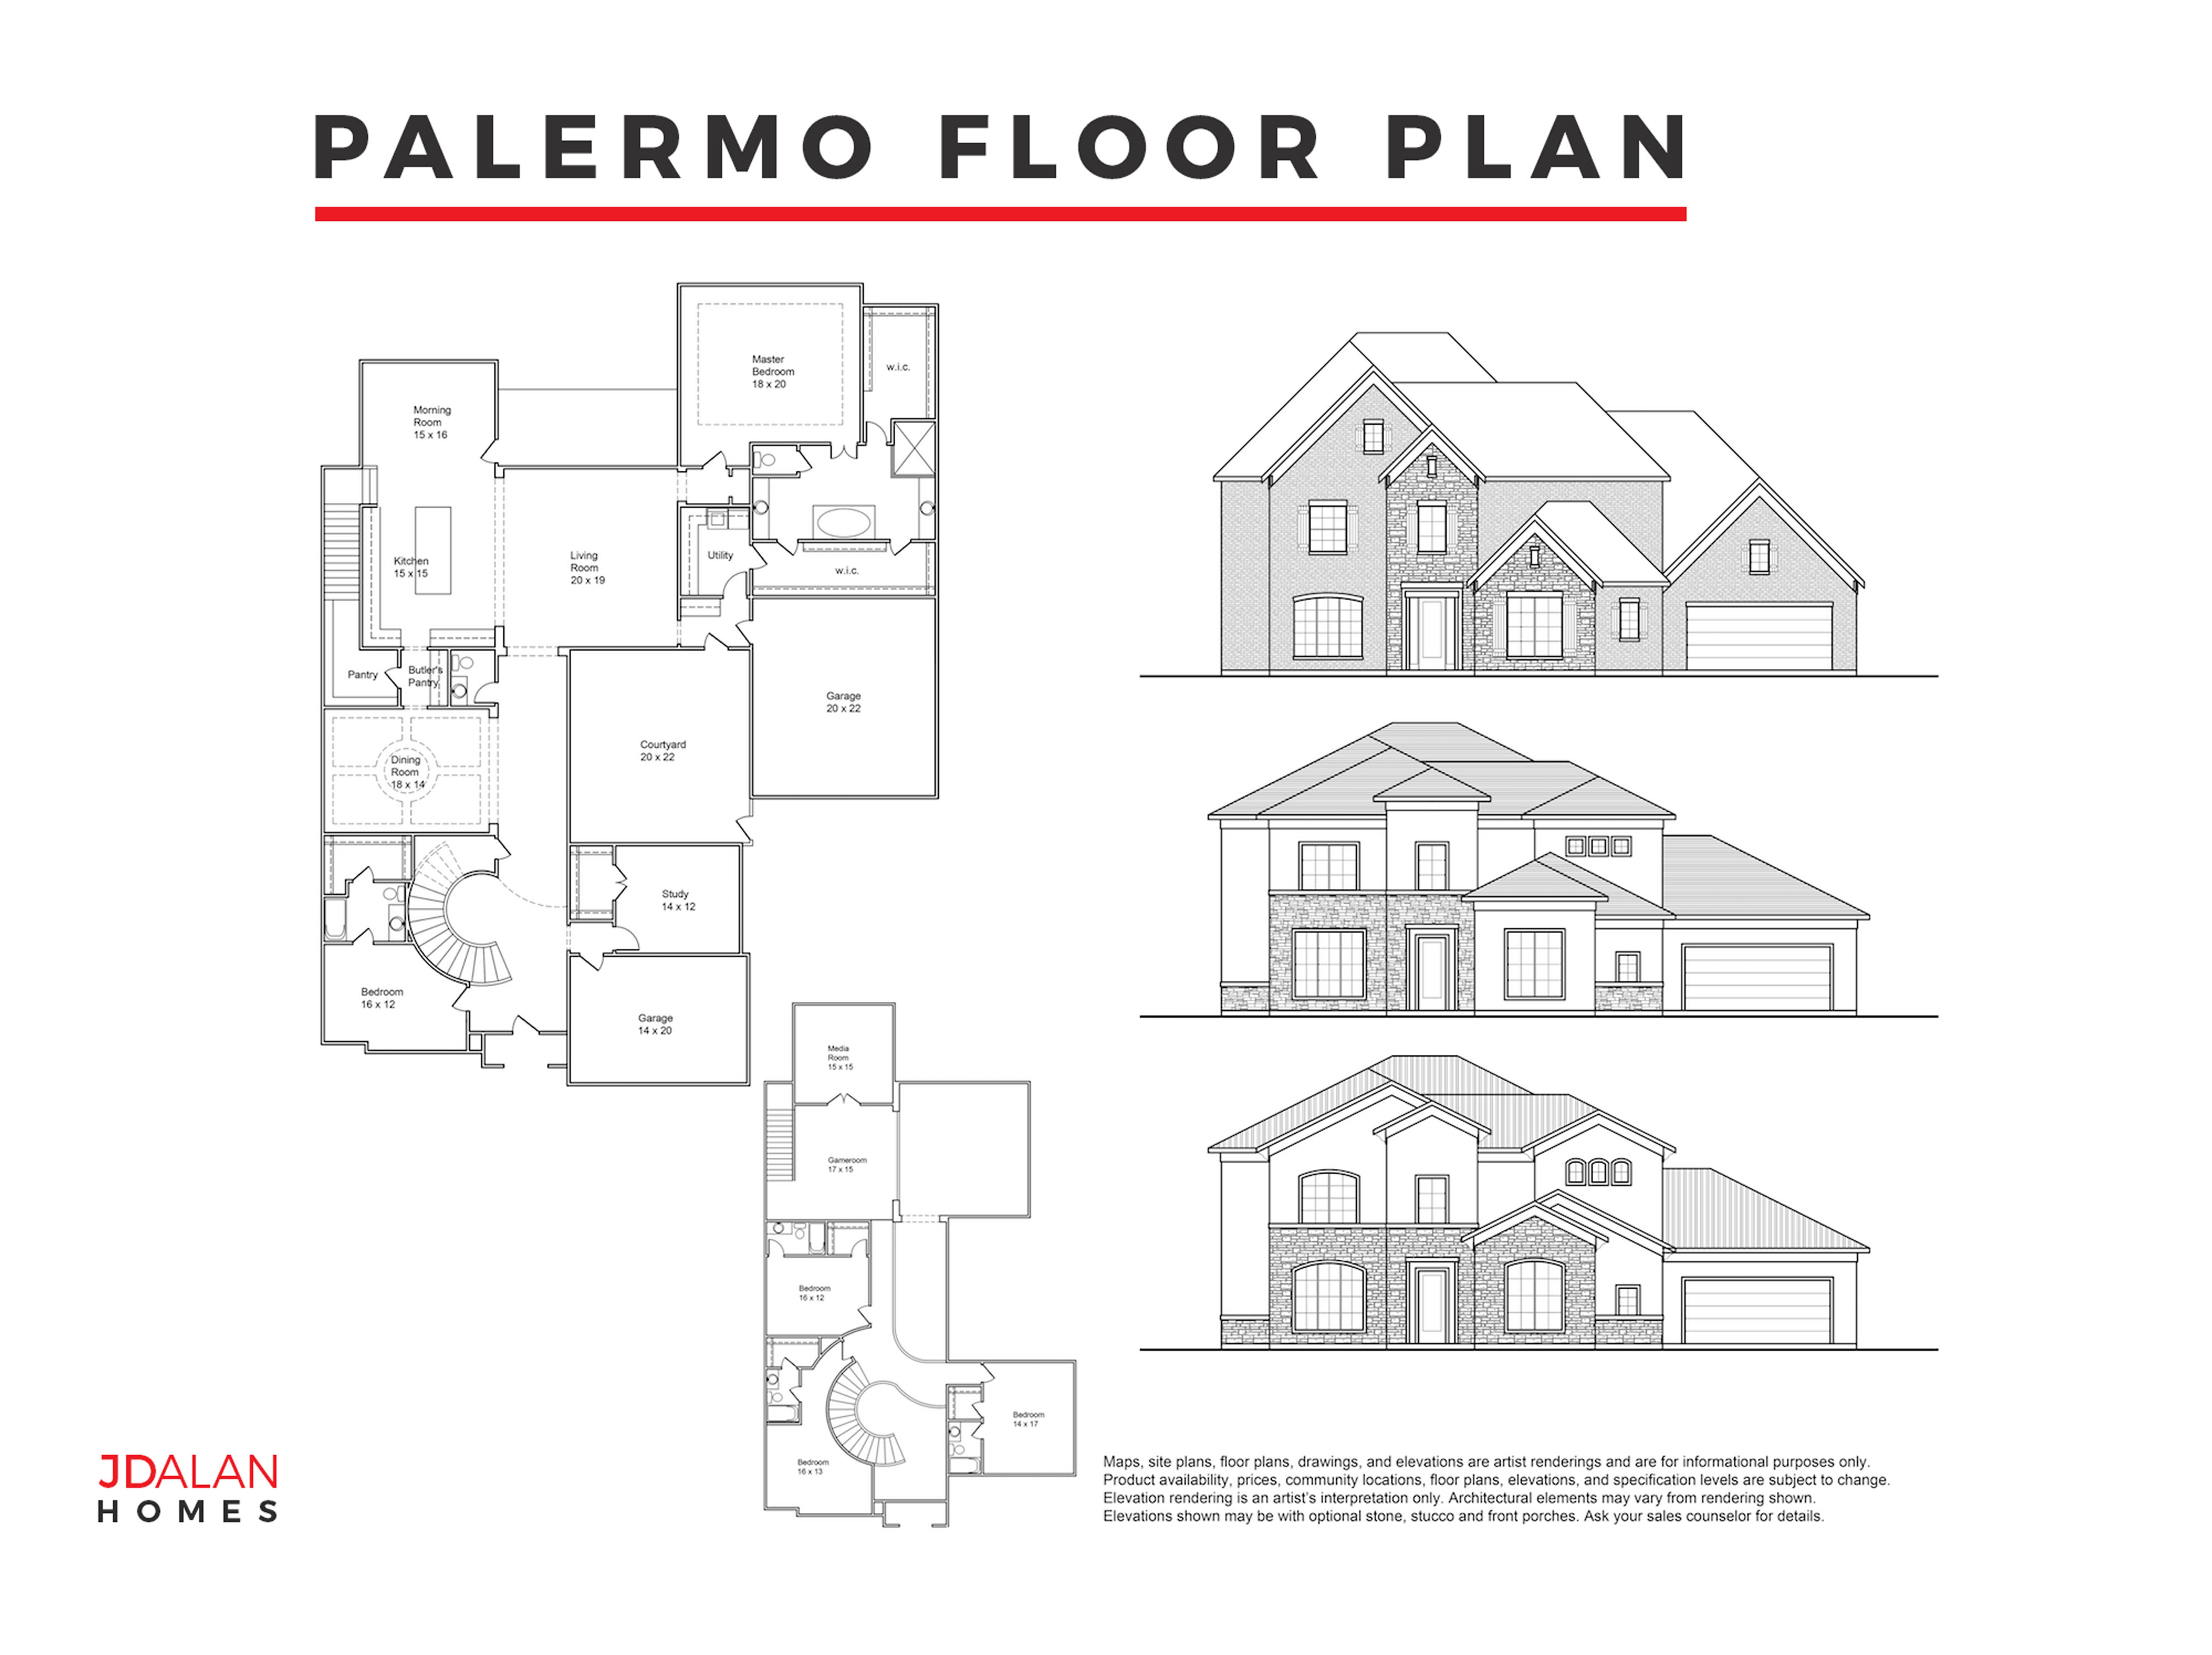 PALERMO FLOOR PLAN #5333